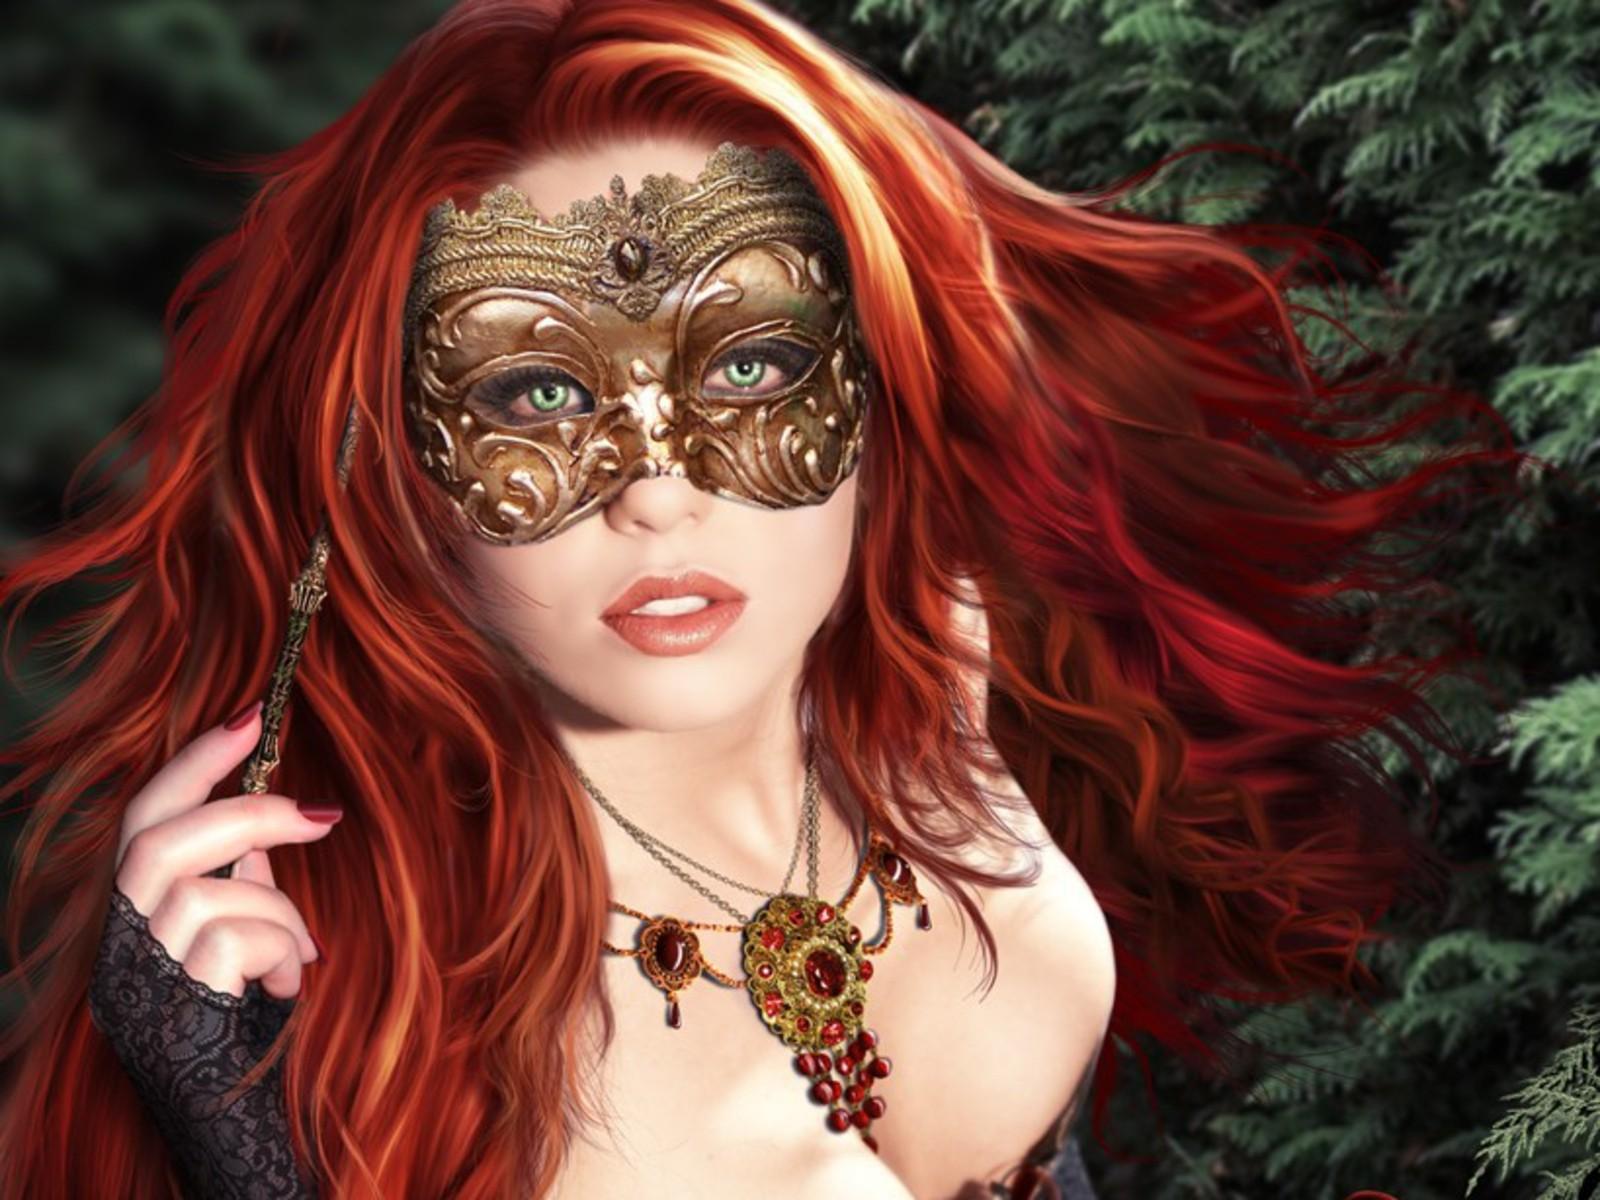 Фото девушек в маске арт